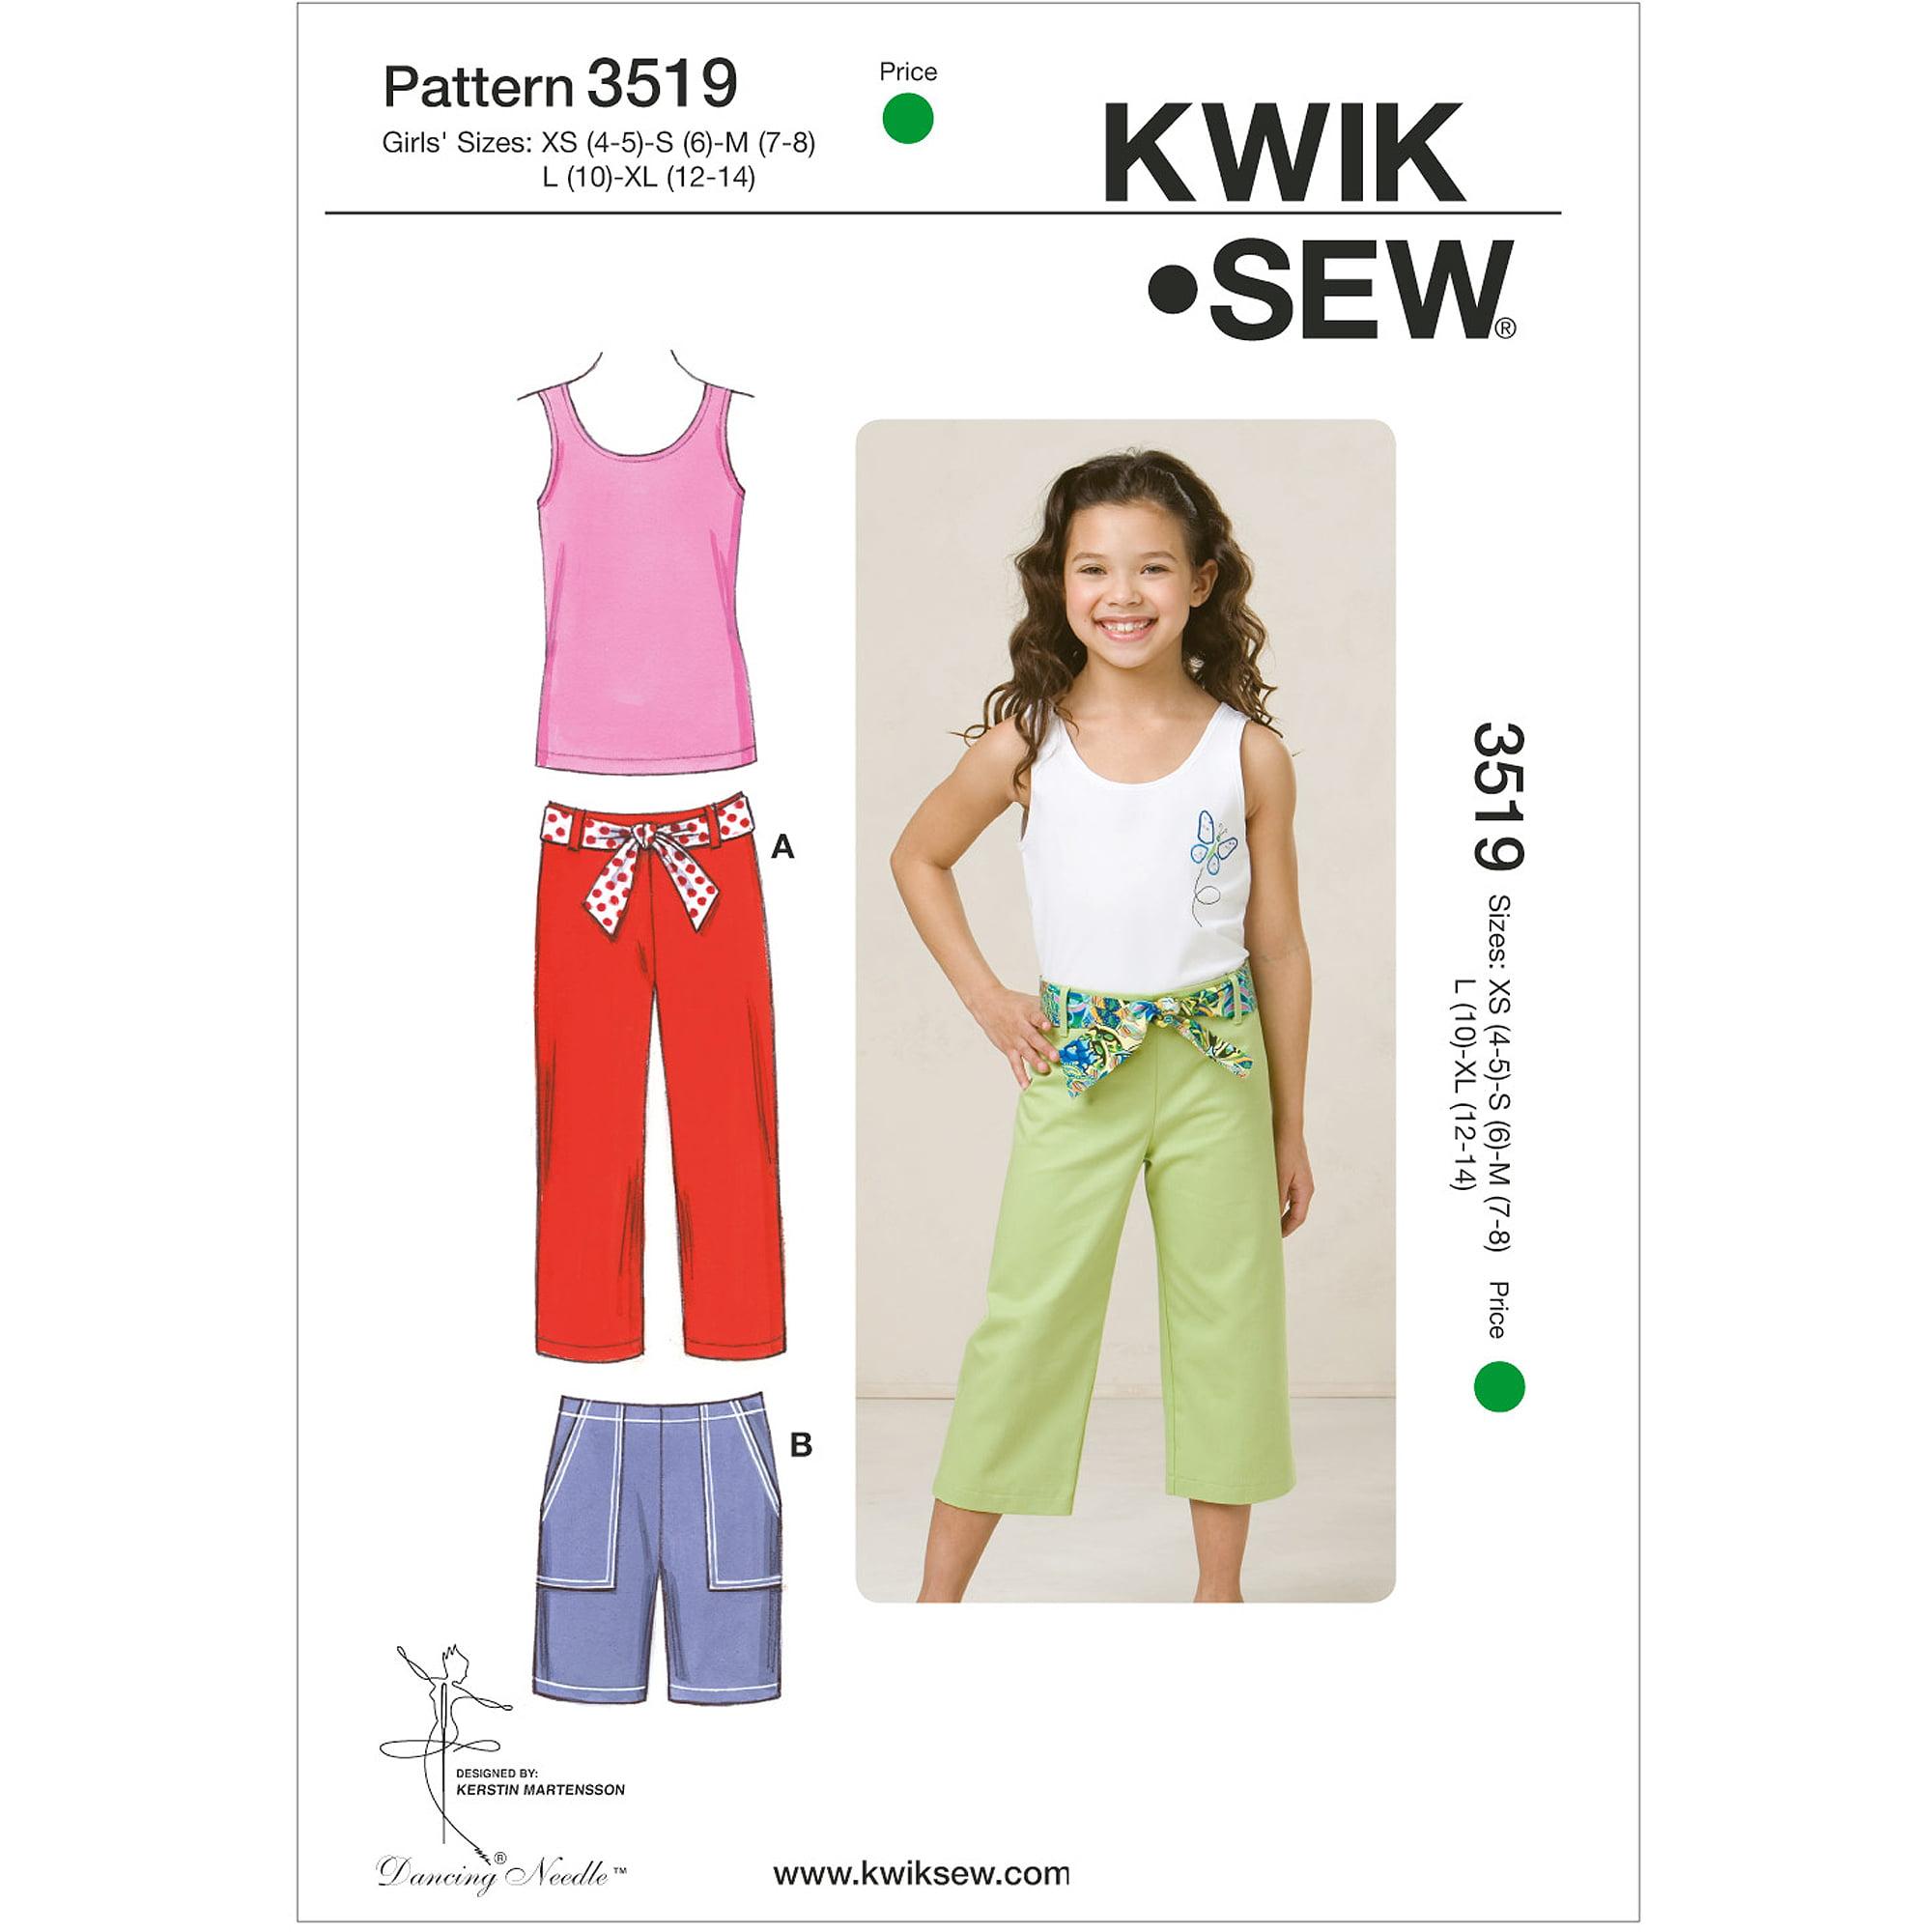 Kwik Sew Pattern Pants, Shorts and Top, XS (4, 5), S (6), M (7, 8), L (10), XL (12)